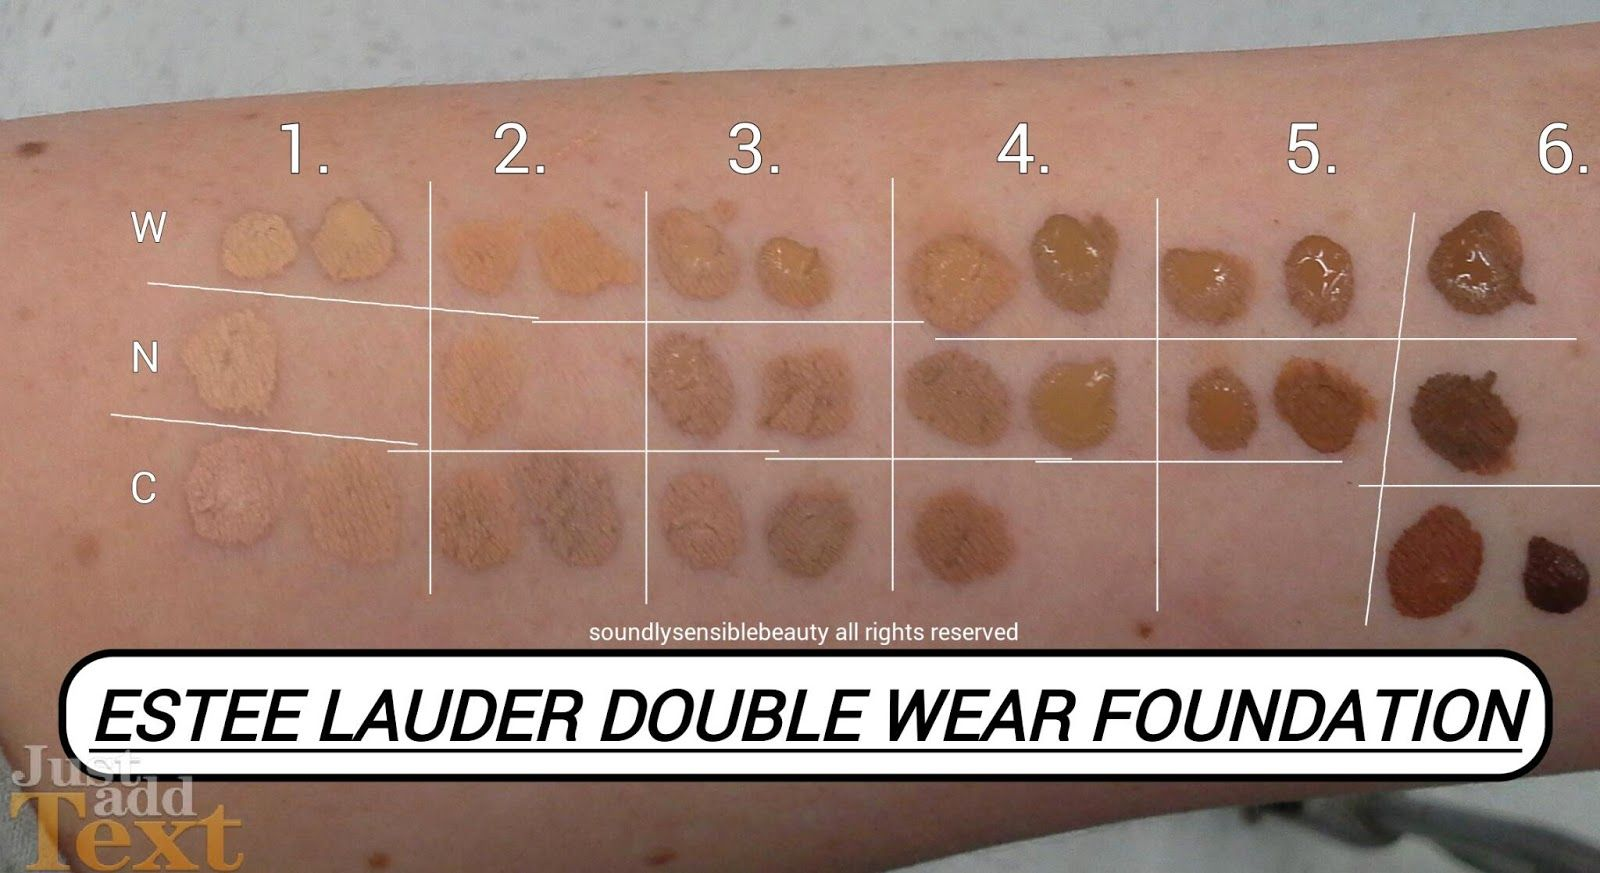 Estee Lauder Double Wear Foundation 6w1 Google Search